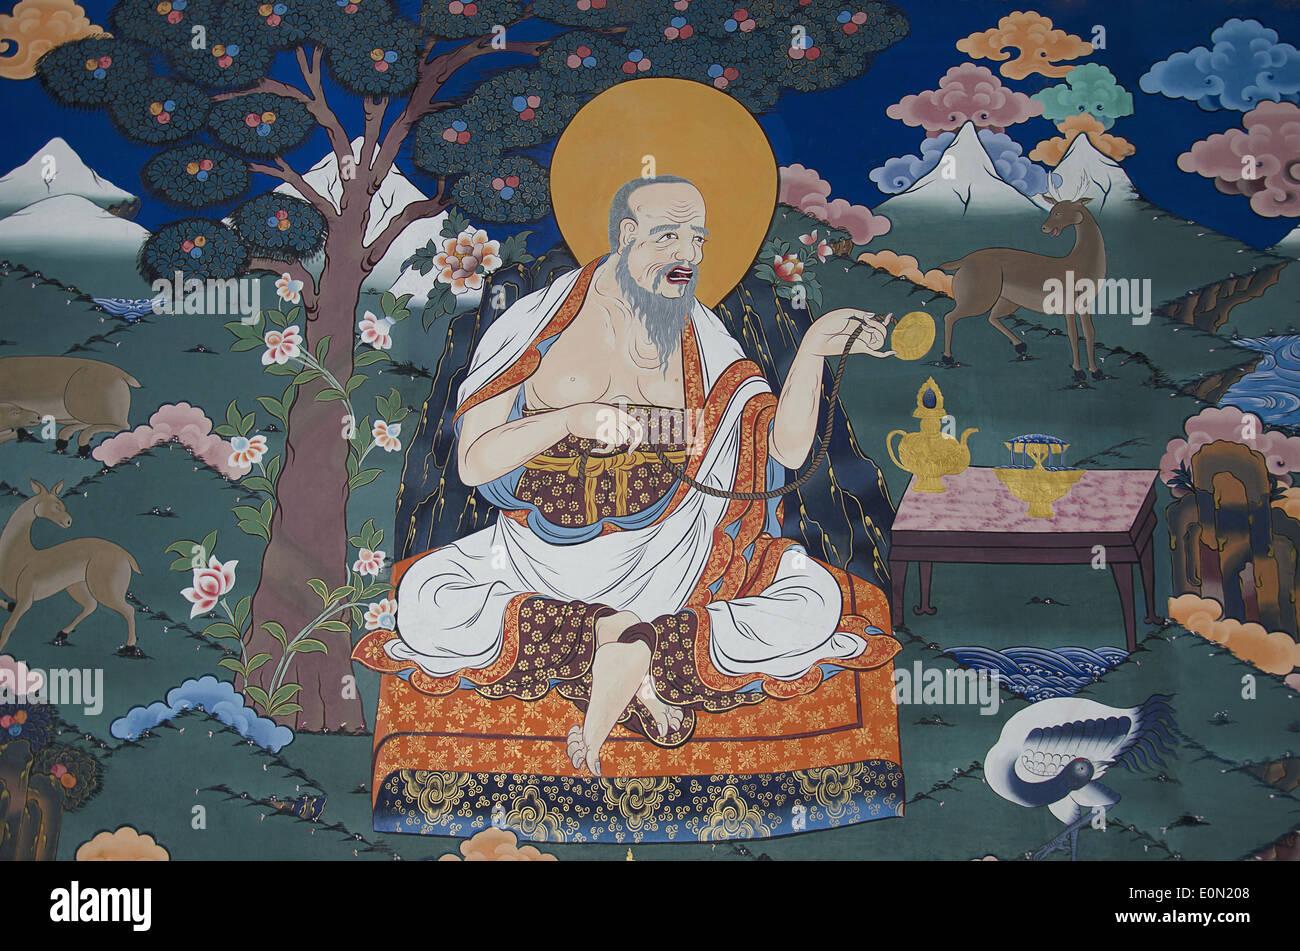 A wall painting inside the Rinpung Dzong, Drukpa Kagyu Buddhist monastery, Paro, Bhutan - Stock Image